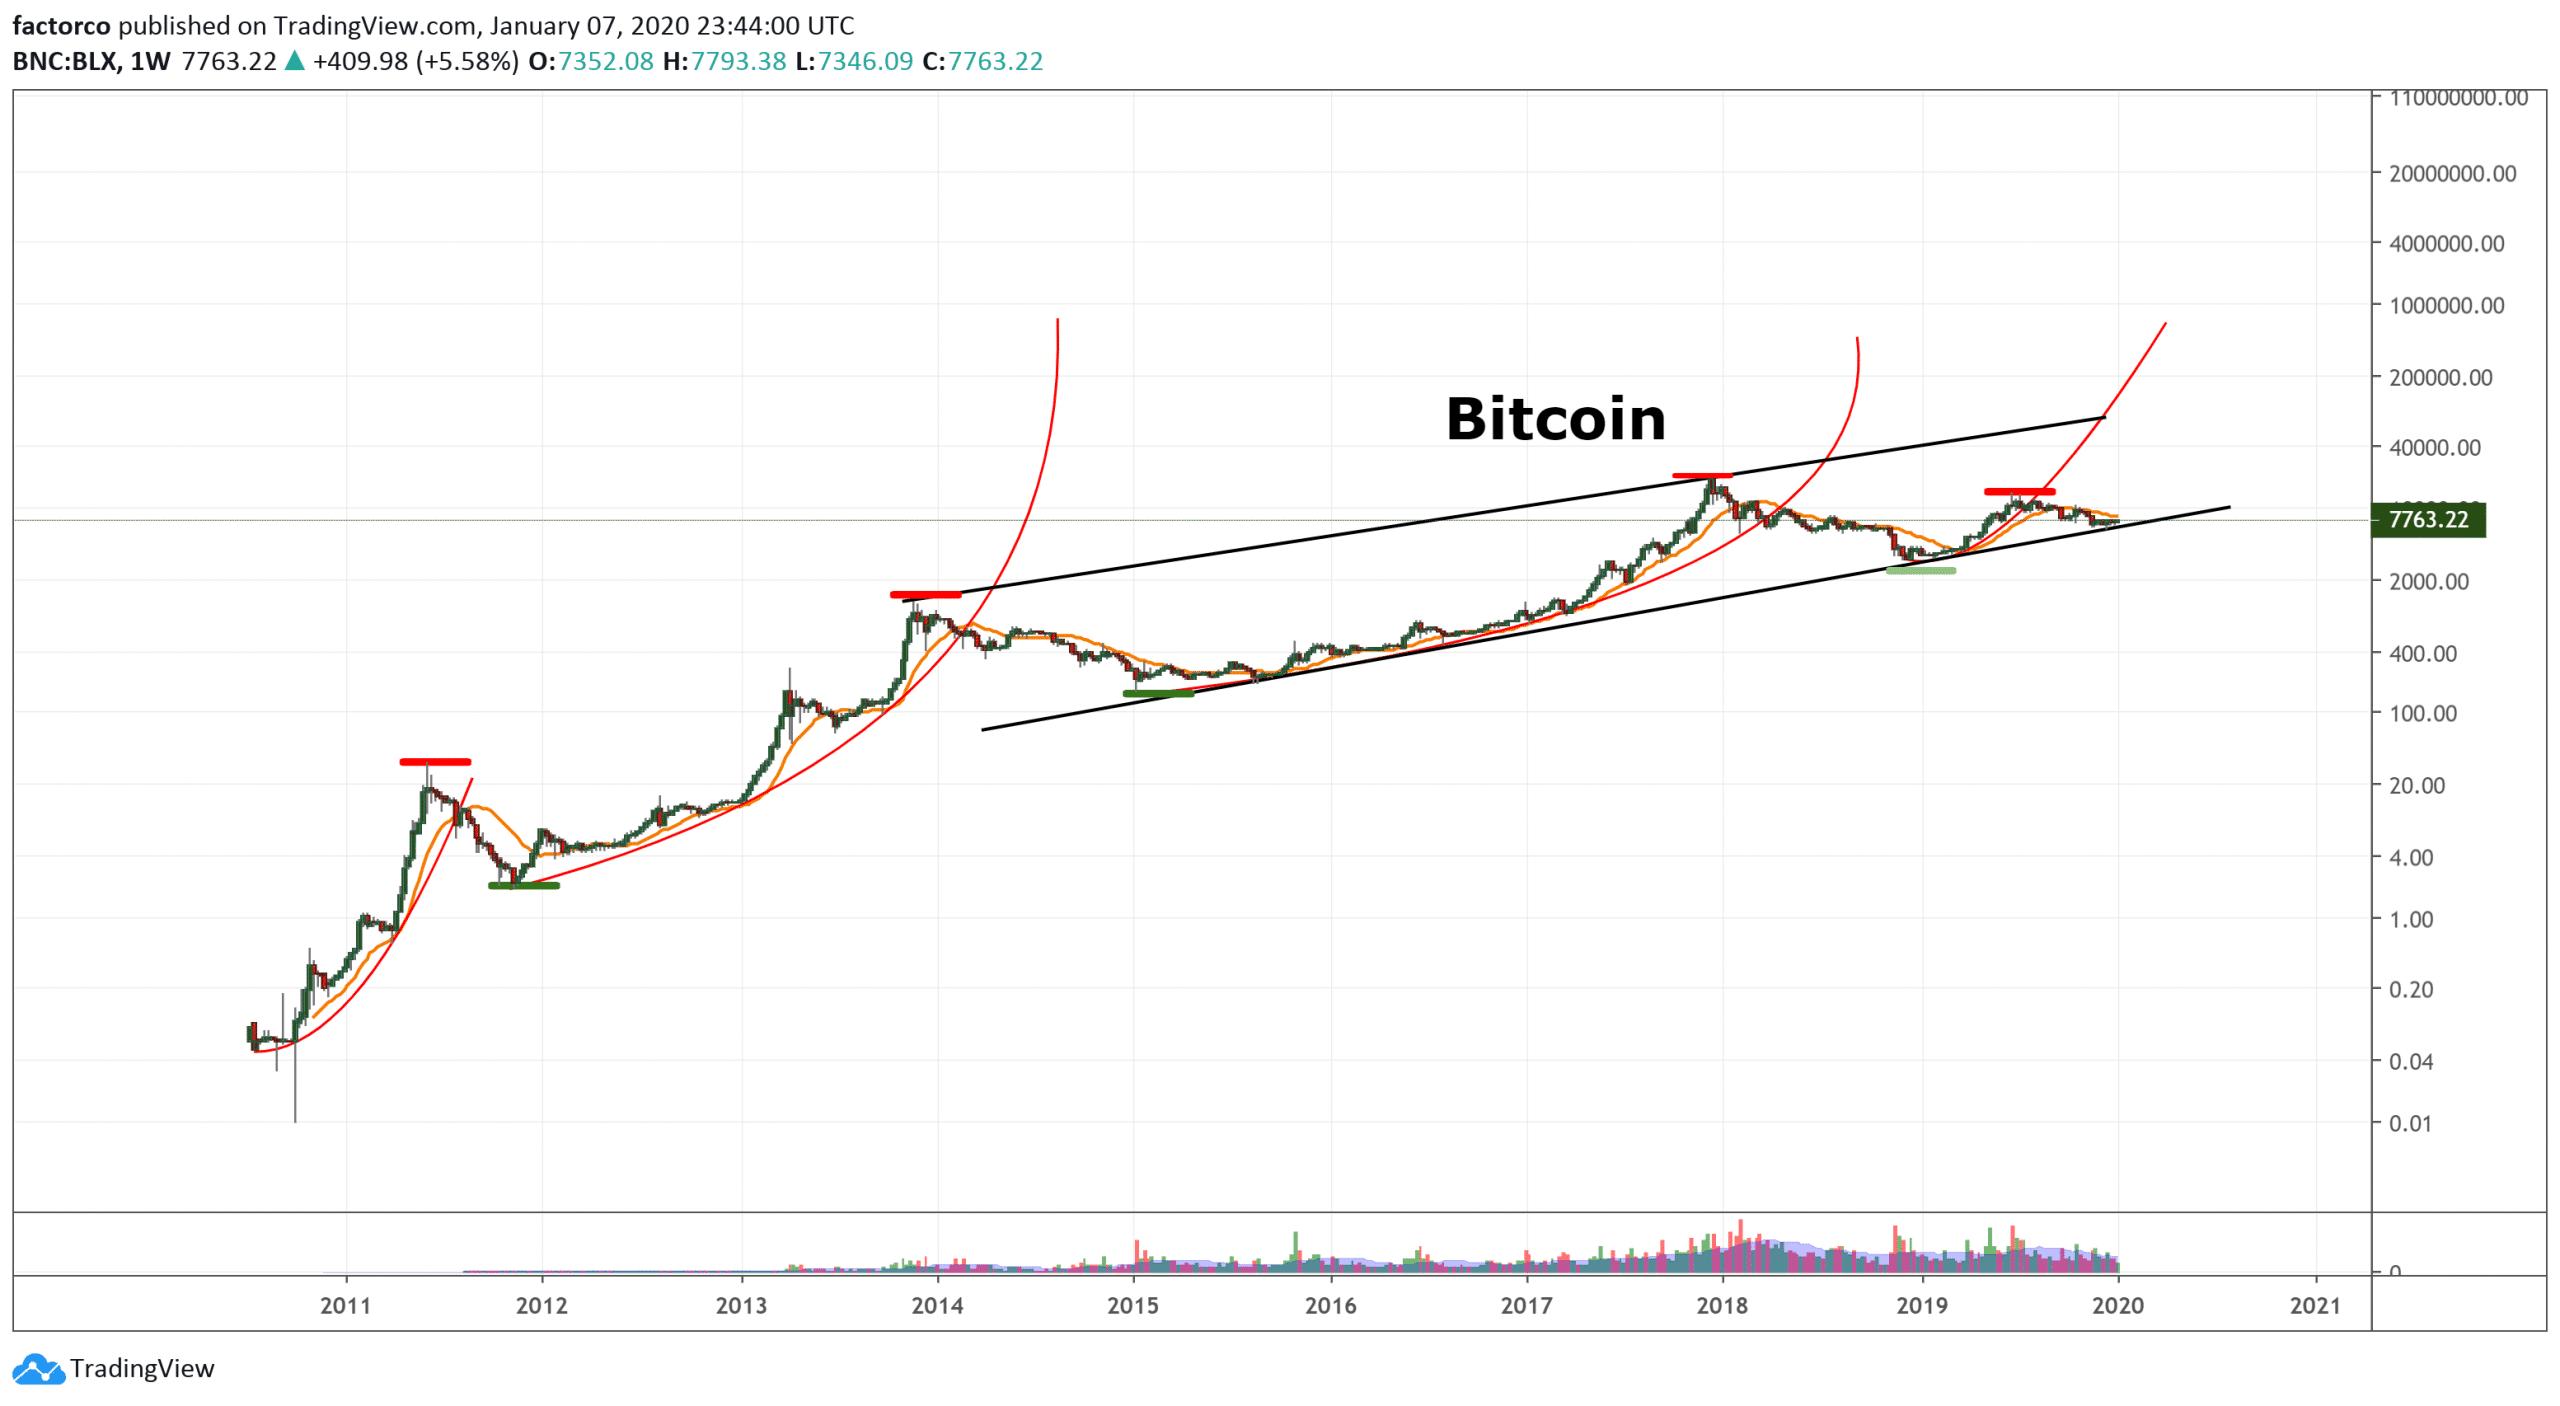 biểu đồ giá bitcoin